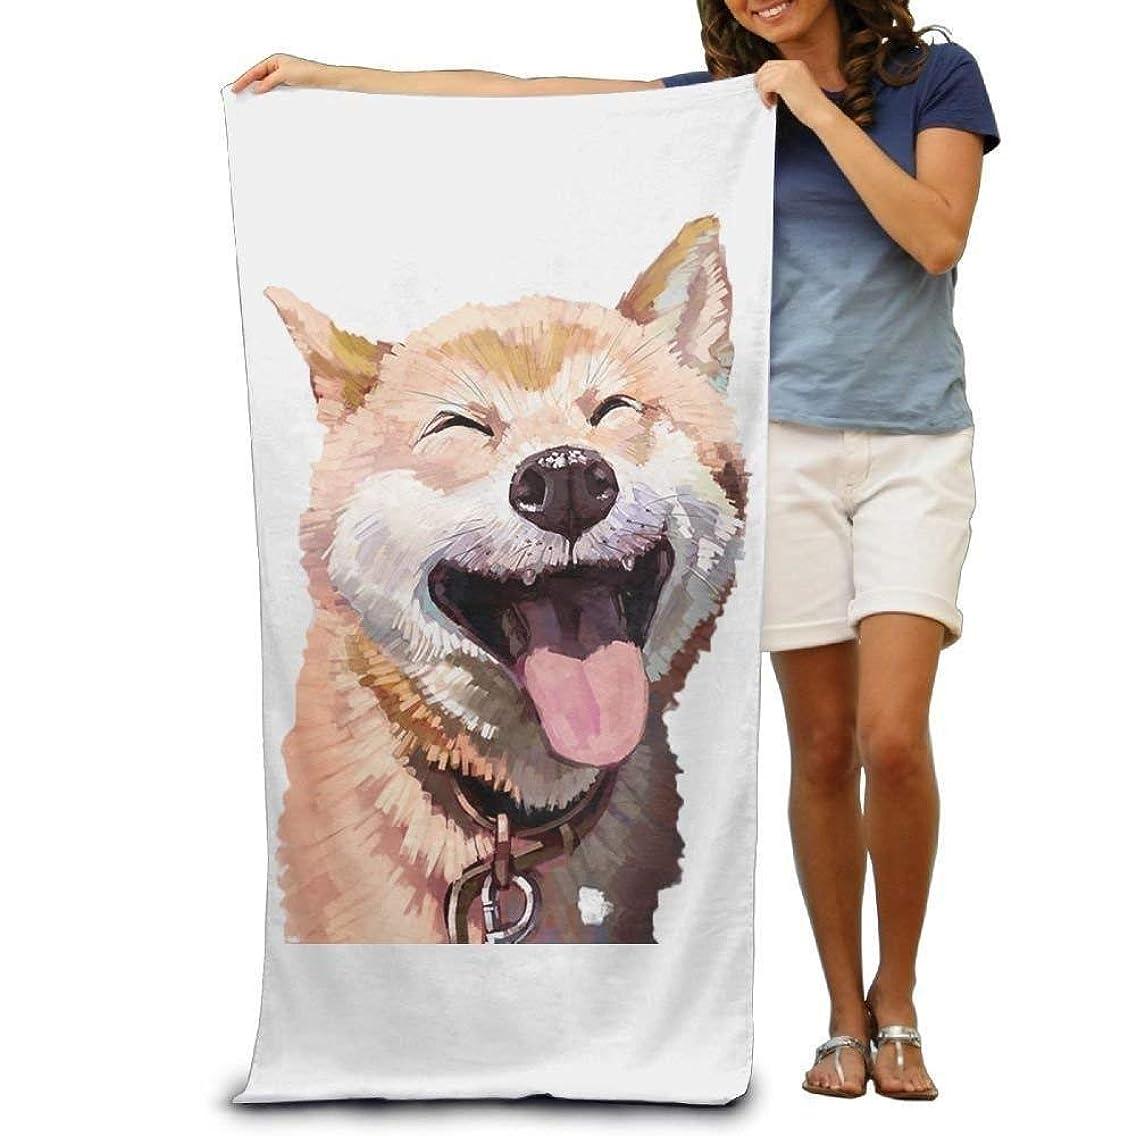 TOGEFRIEND Bath Towel Cute Shiba Creative Patterned Soft Beach Towel 31